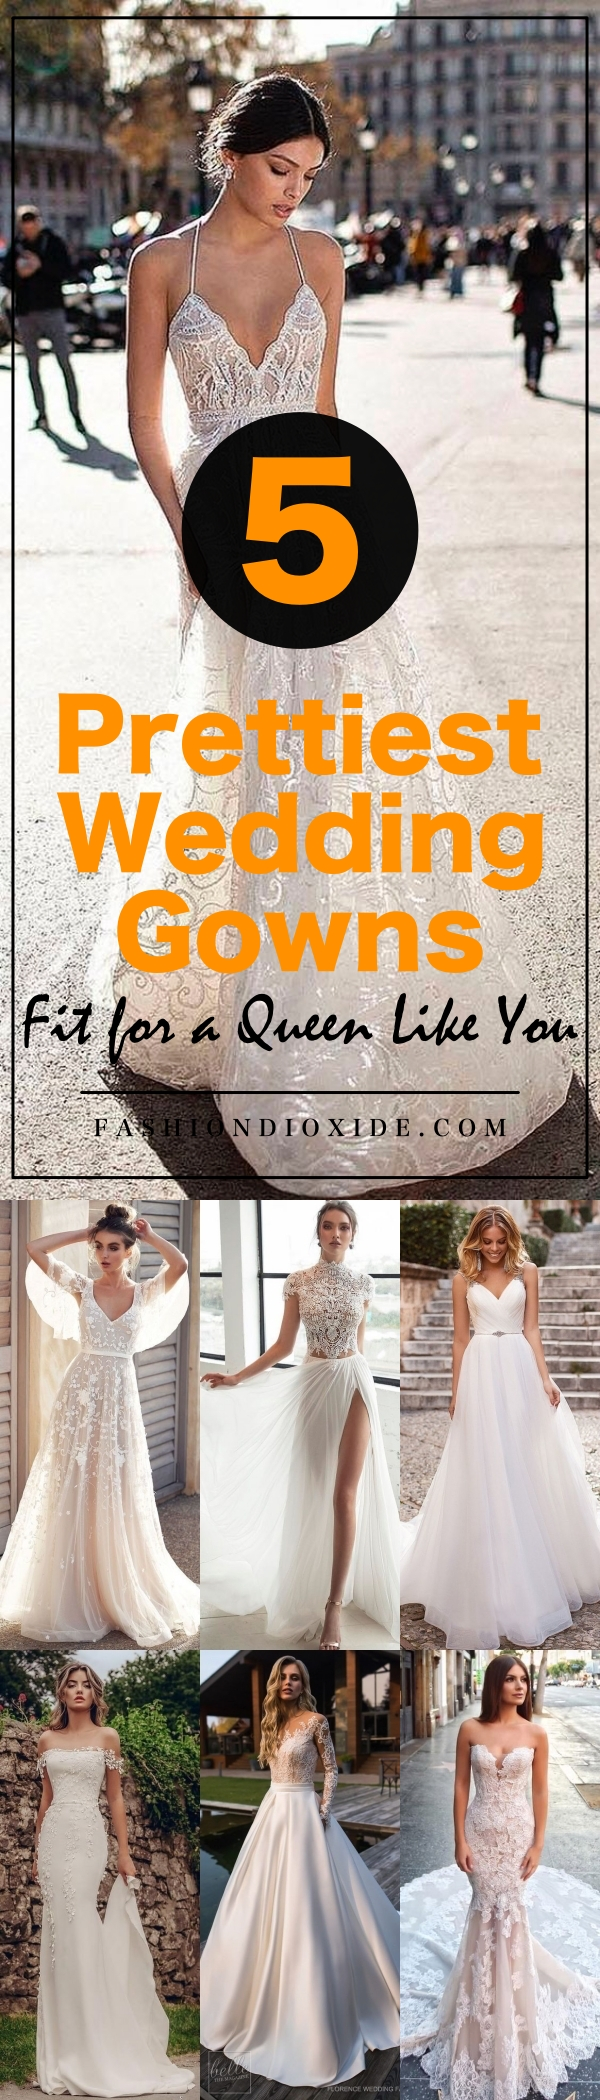 Prettiest-Wedding-Gowns